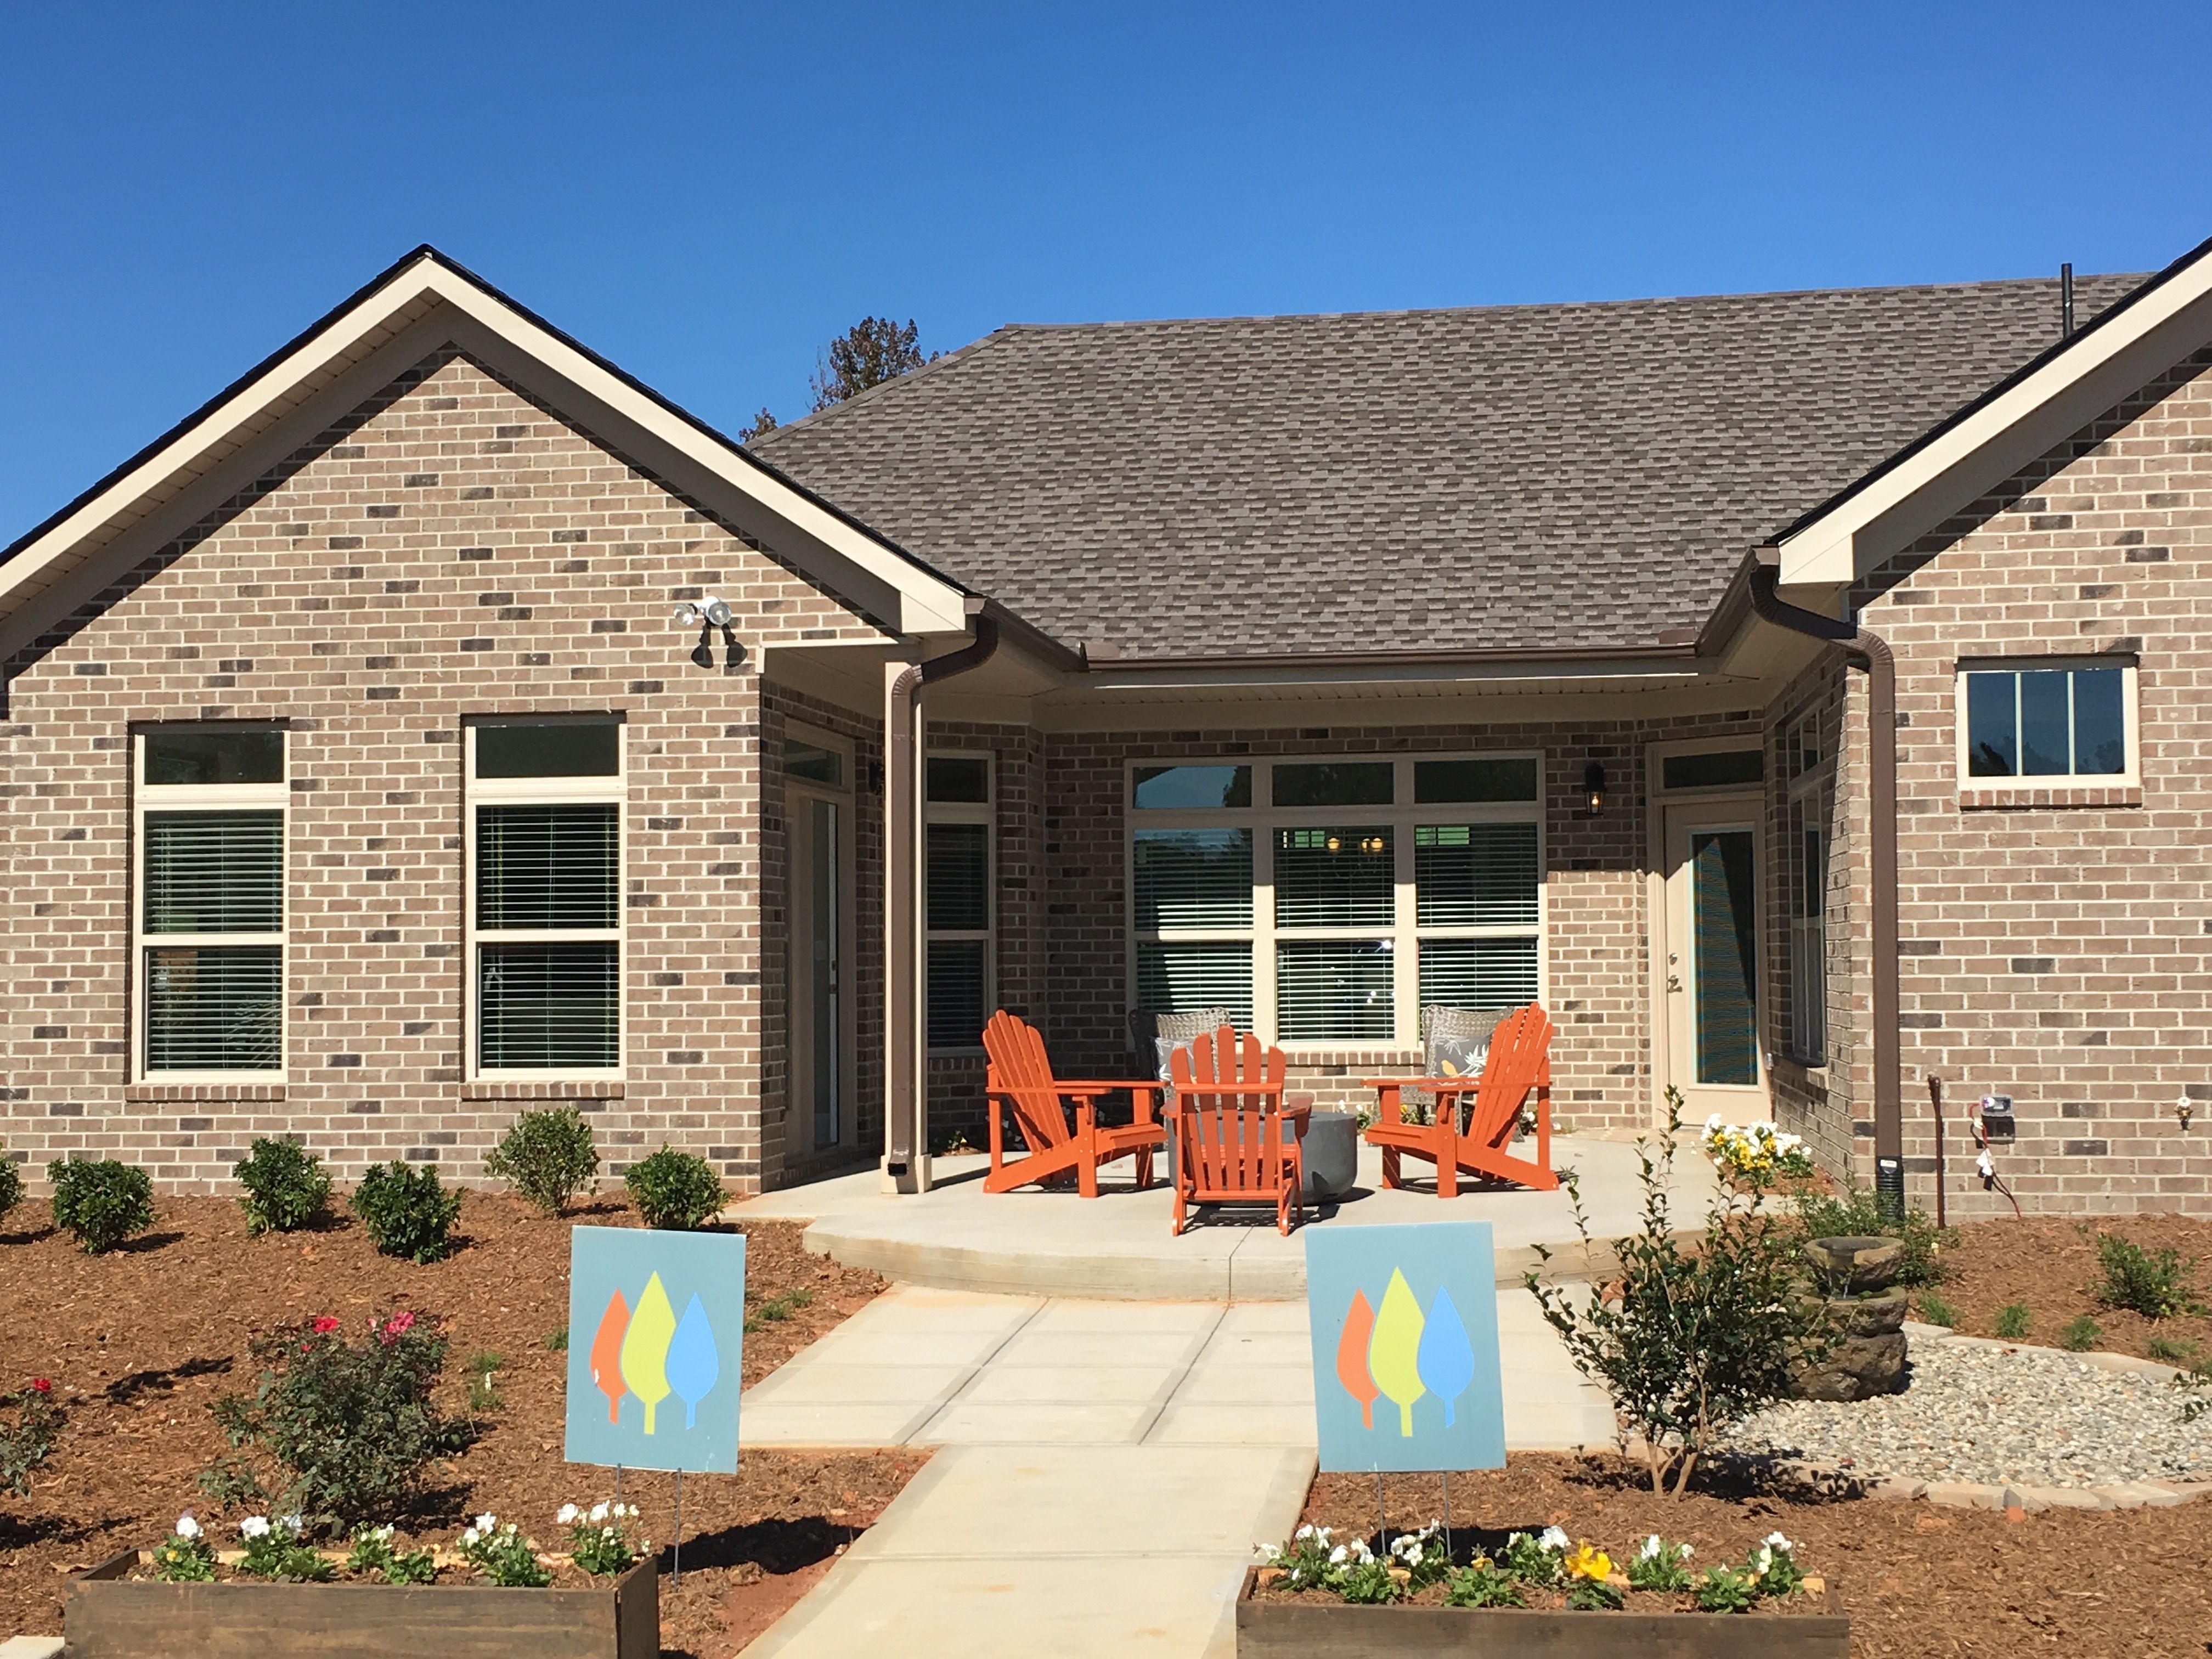 New Homes for Sale Charlotte North Carolina